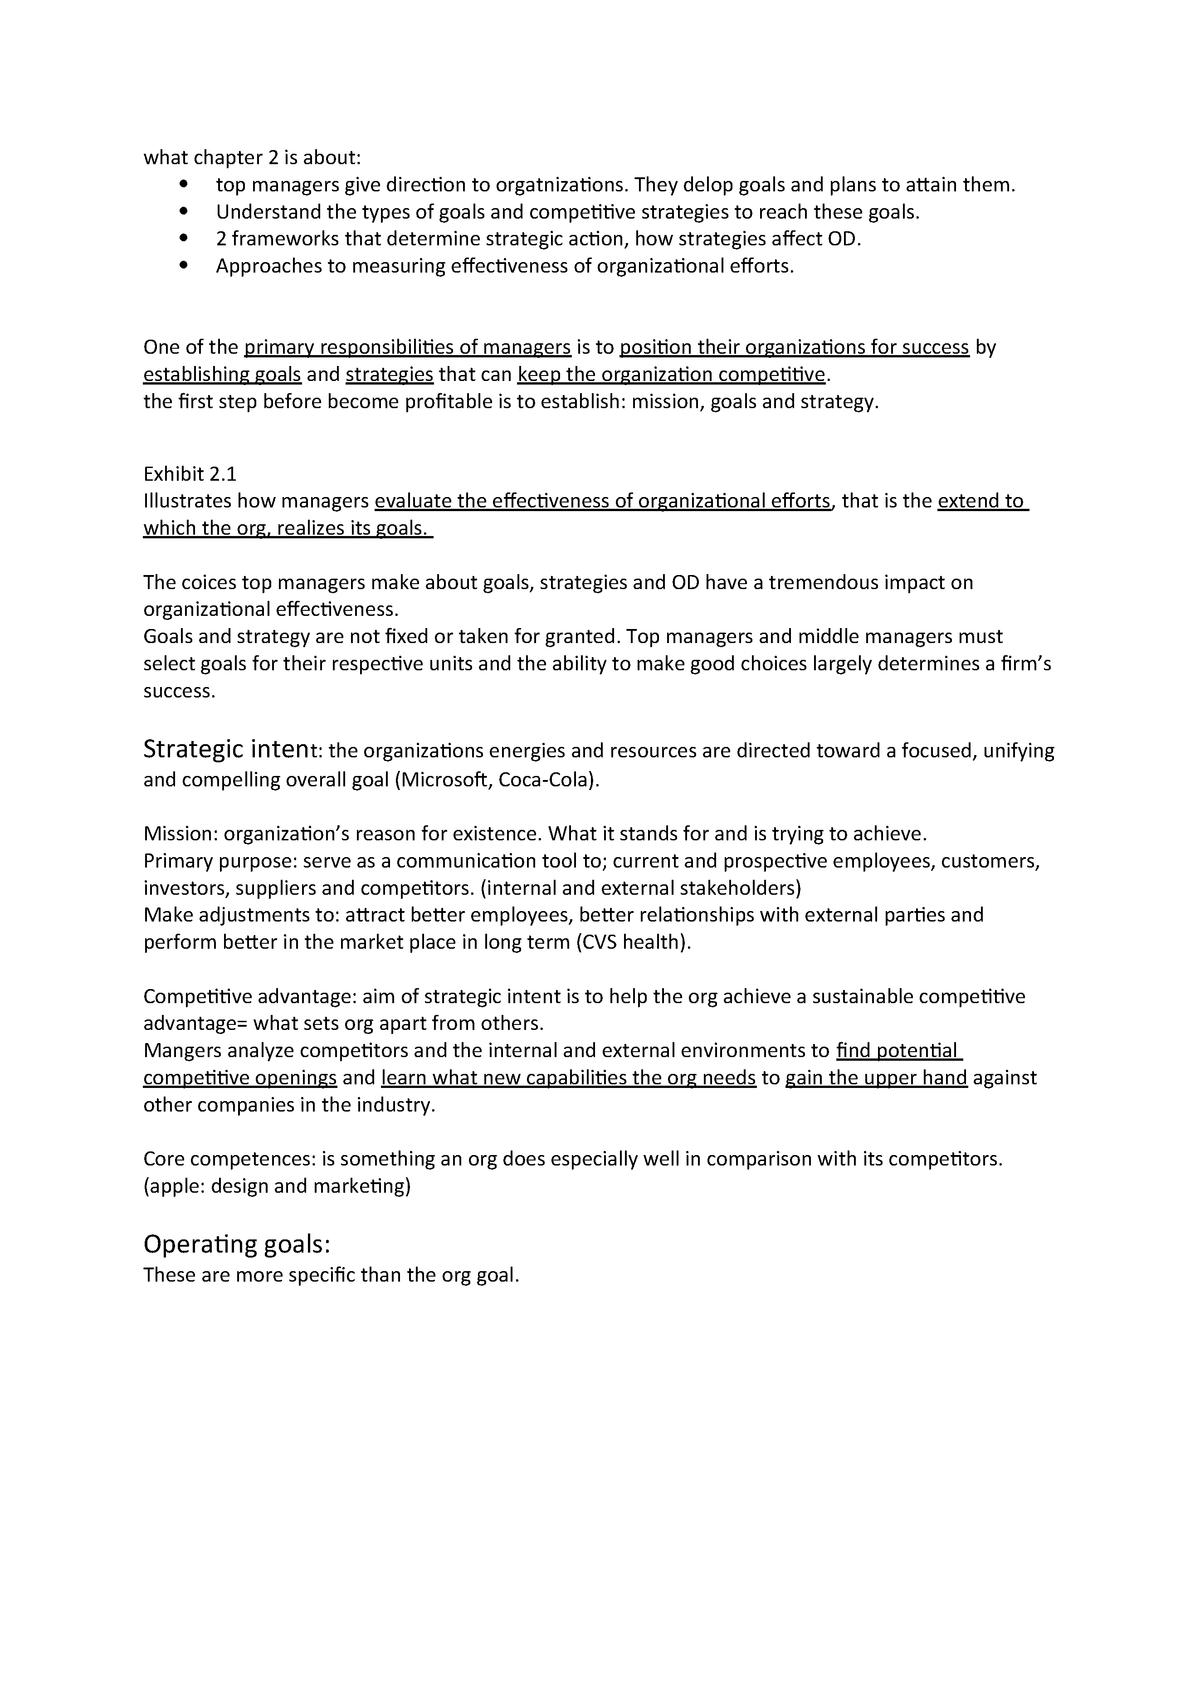 Summary Organization Theory and Design 03 Apr 2018 - StuDocu